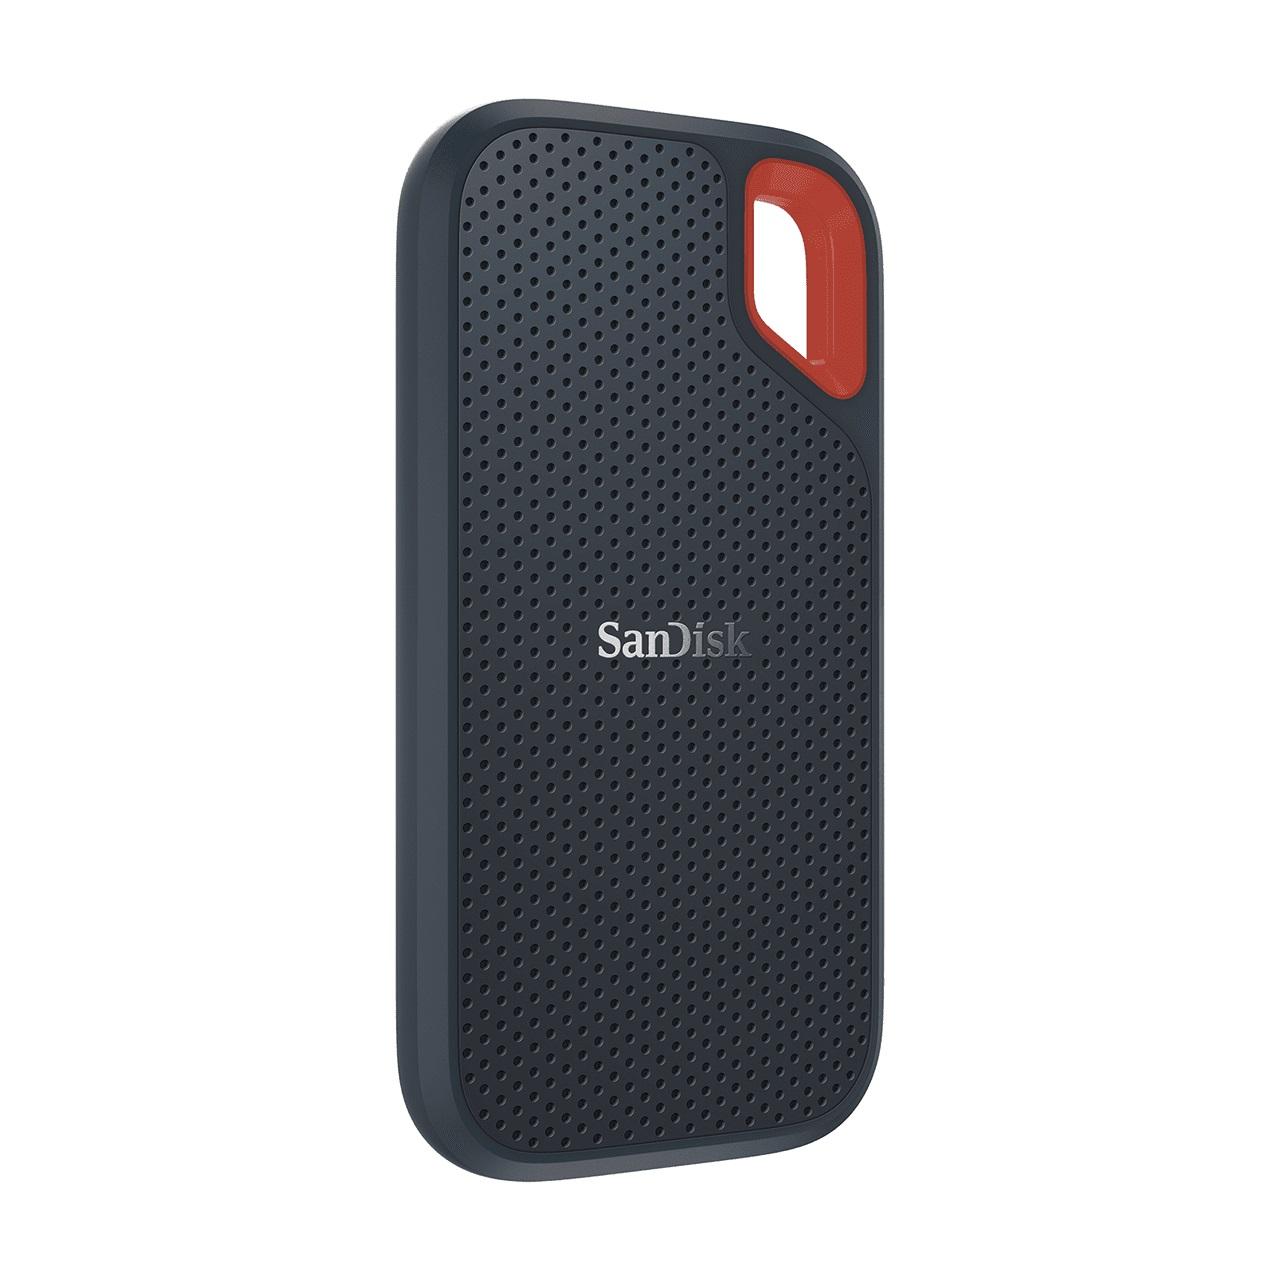 SanDisk Extreme Portable SSD- Fast Storage Solution